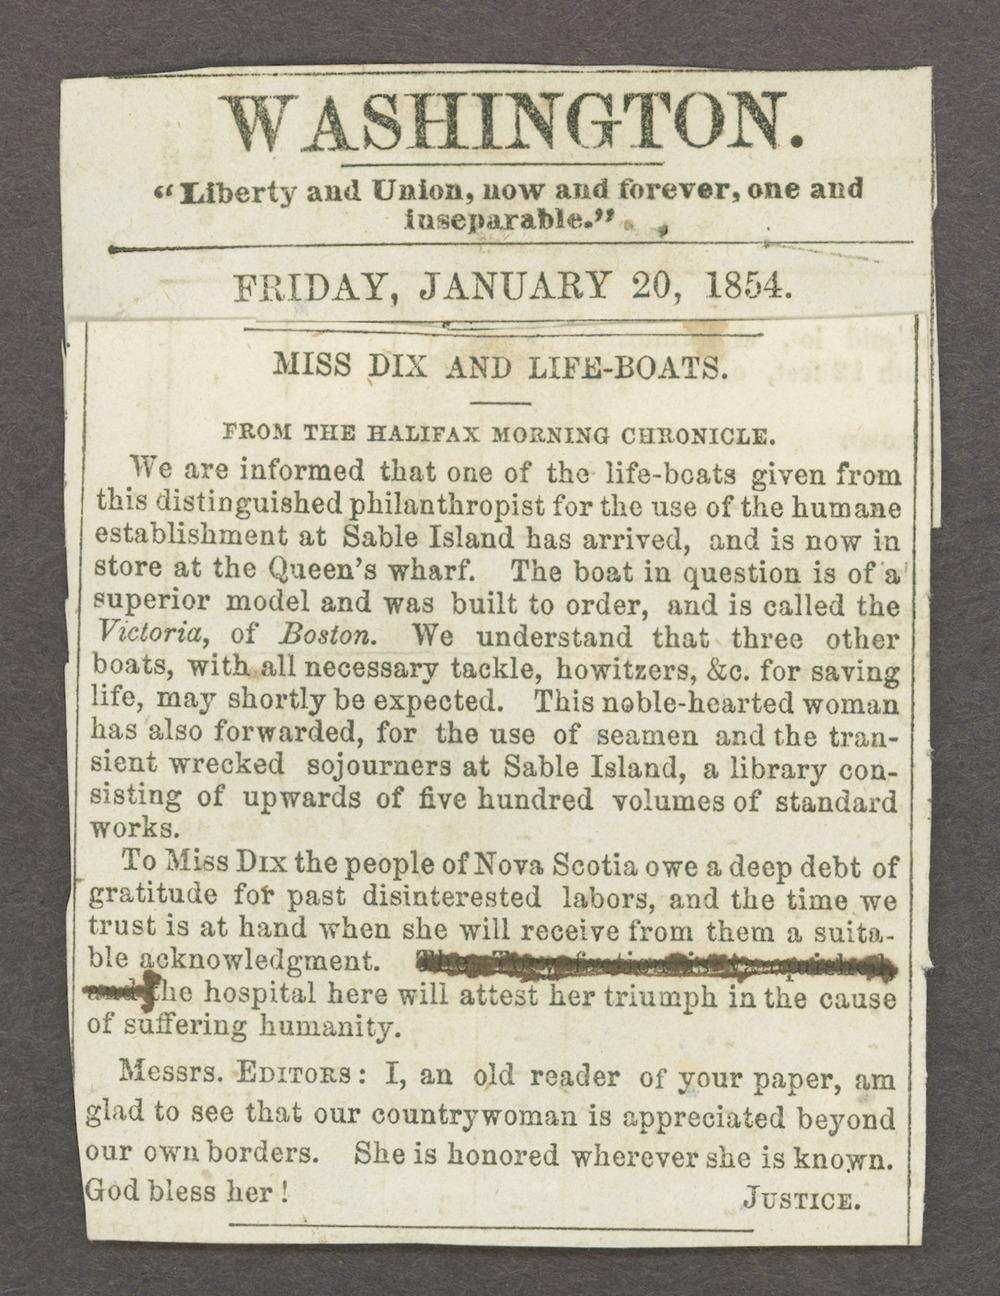 Dorothea Dix correspondence - 1 [Box 1 Folder 1]